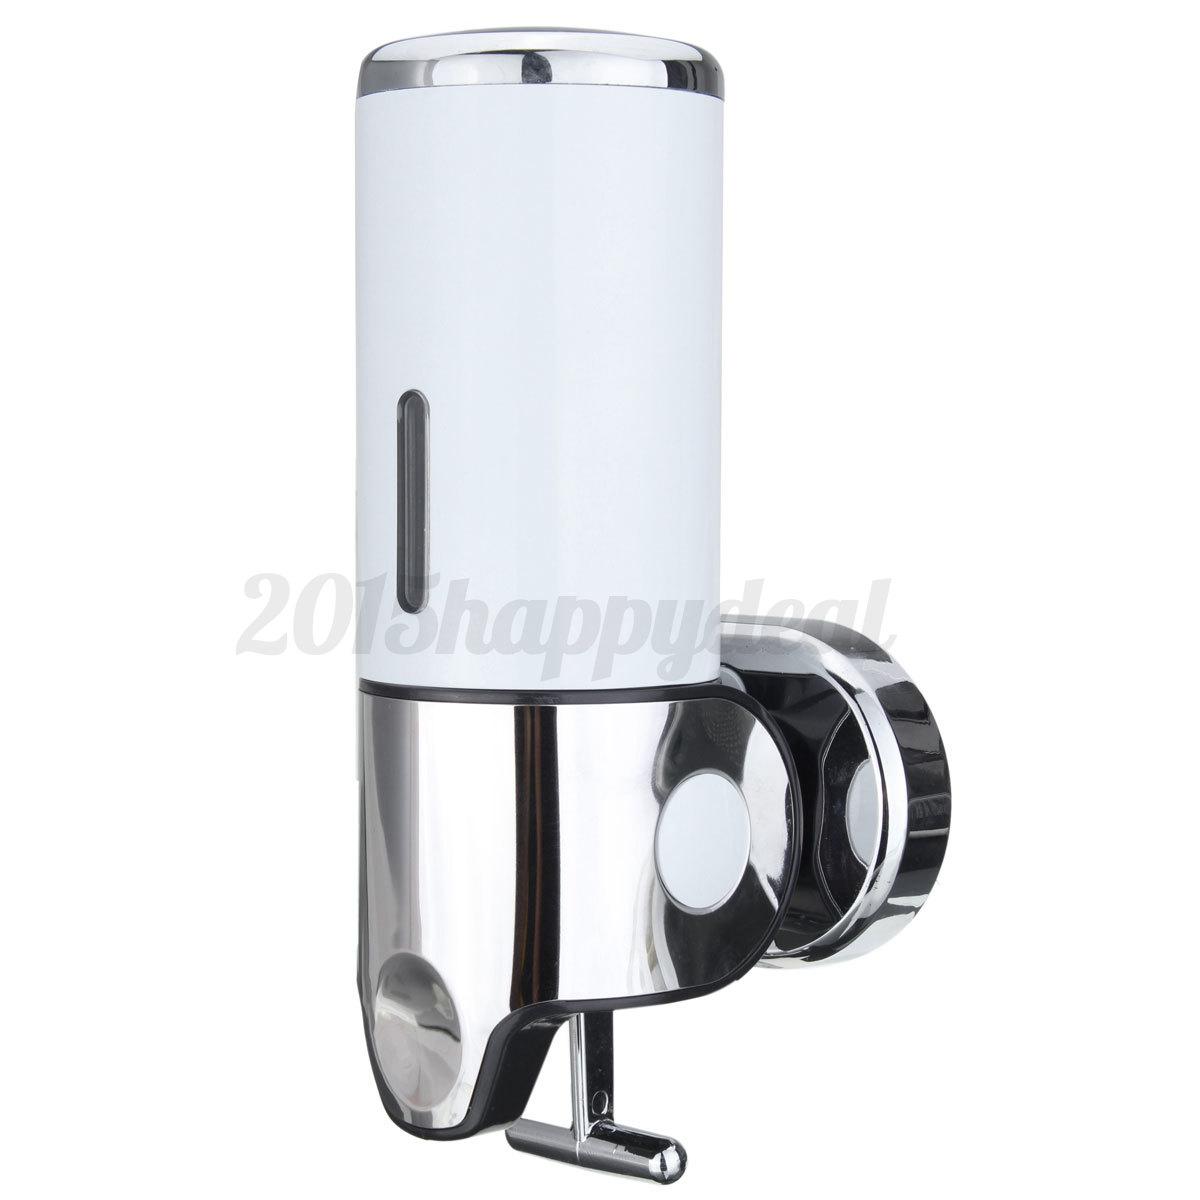 500ml seifenspender dosierer shampoo nachf llbar wand spender bohren edelstahl. Black Bedroom Furniture Sets. Home Design Ideas